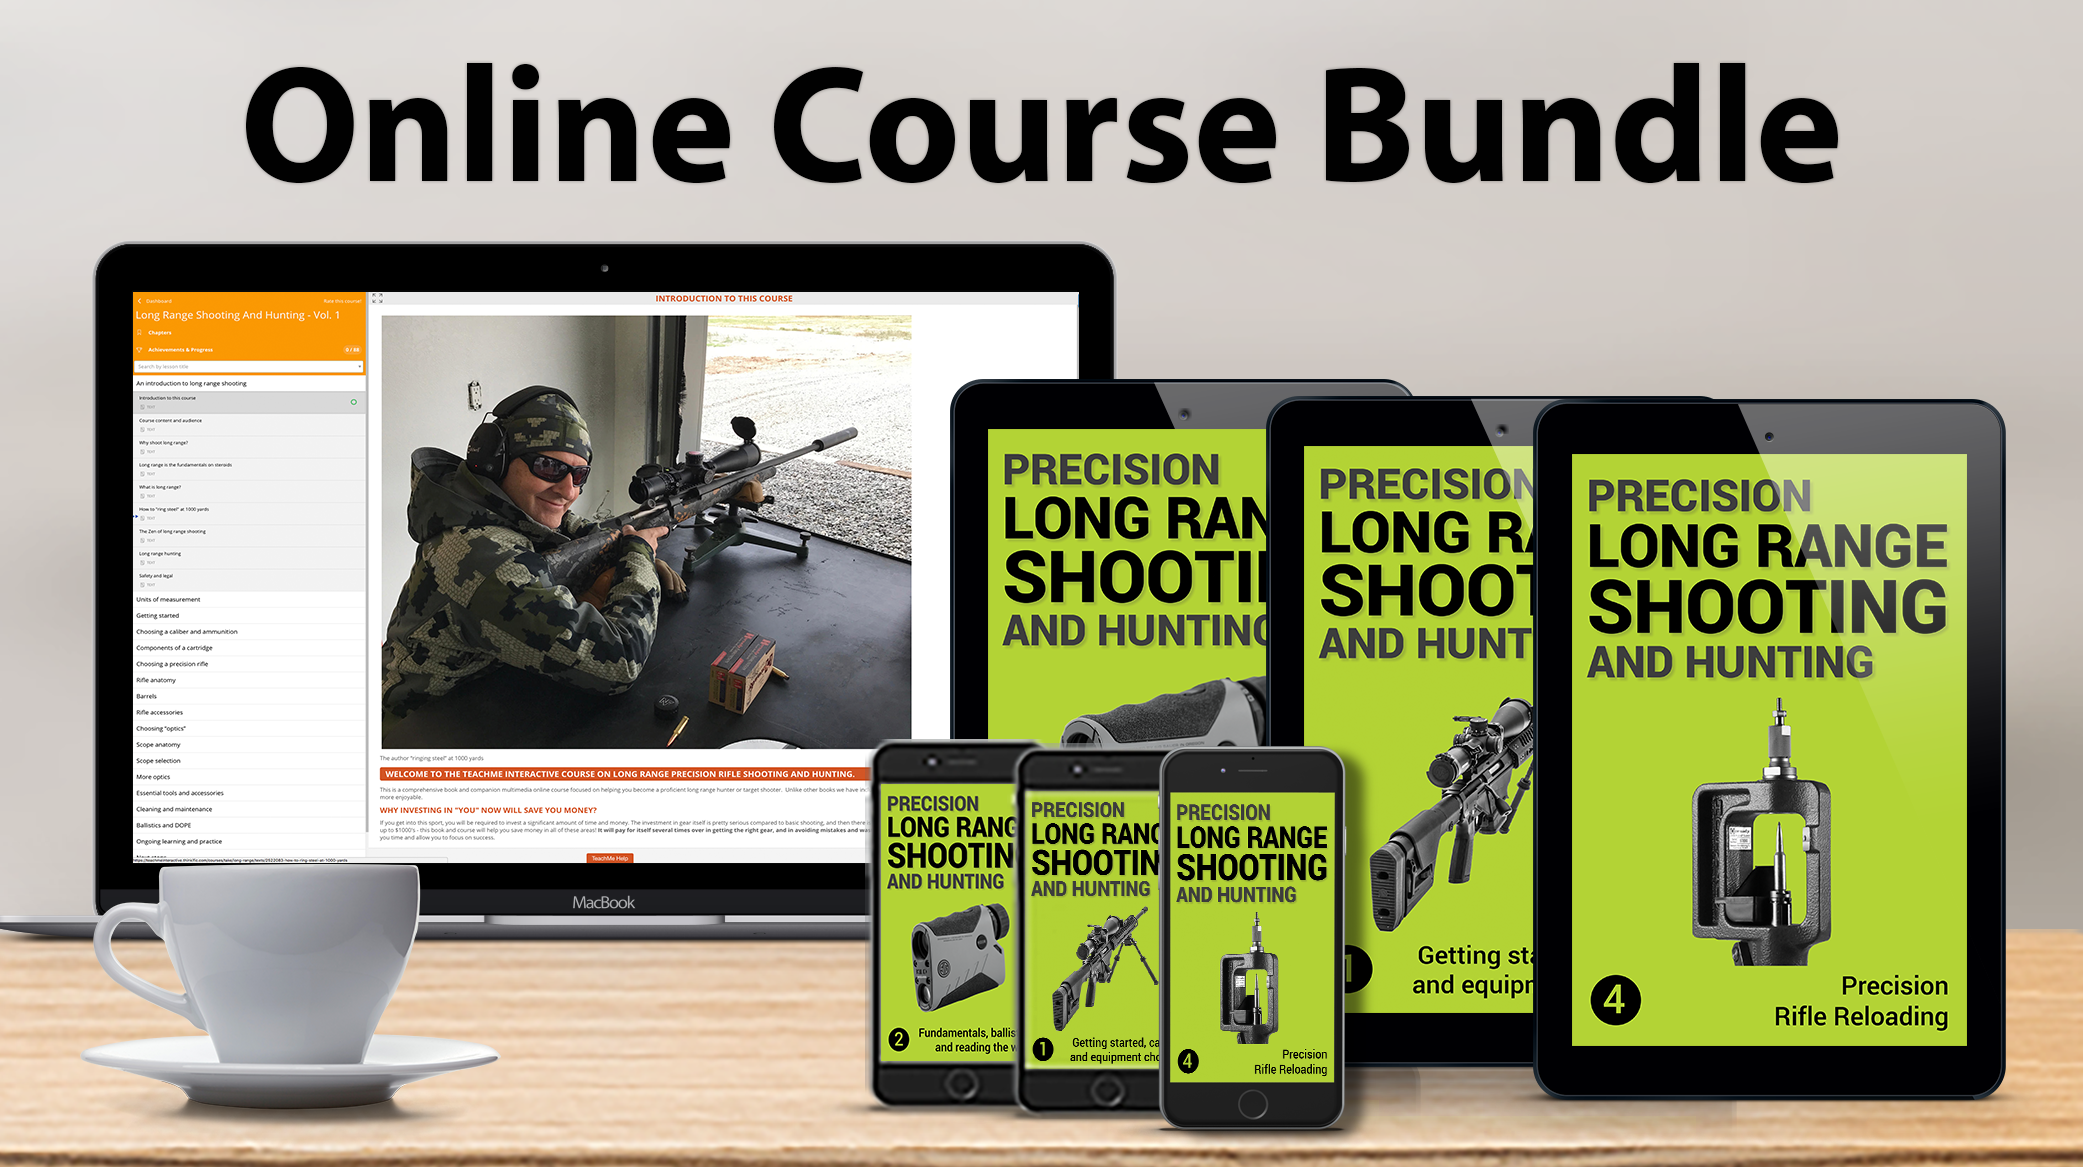 #1 ULTIMATE ONLINE COURSE BUNDLE - LONG RANGE SHOOTING